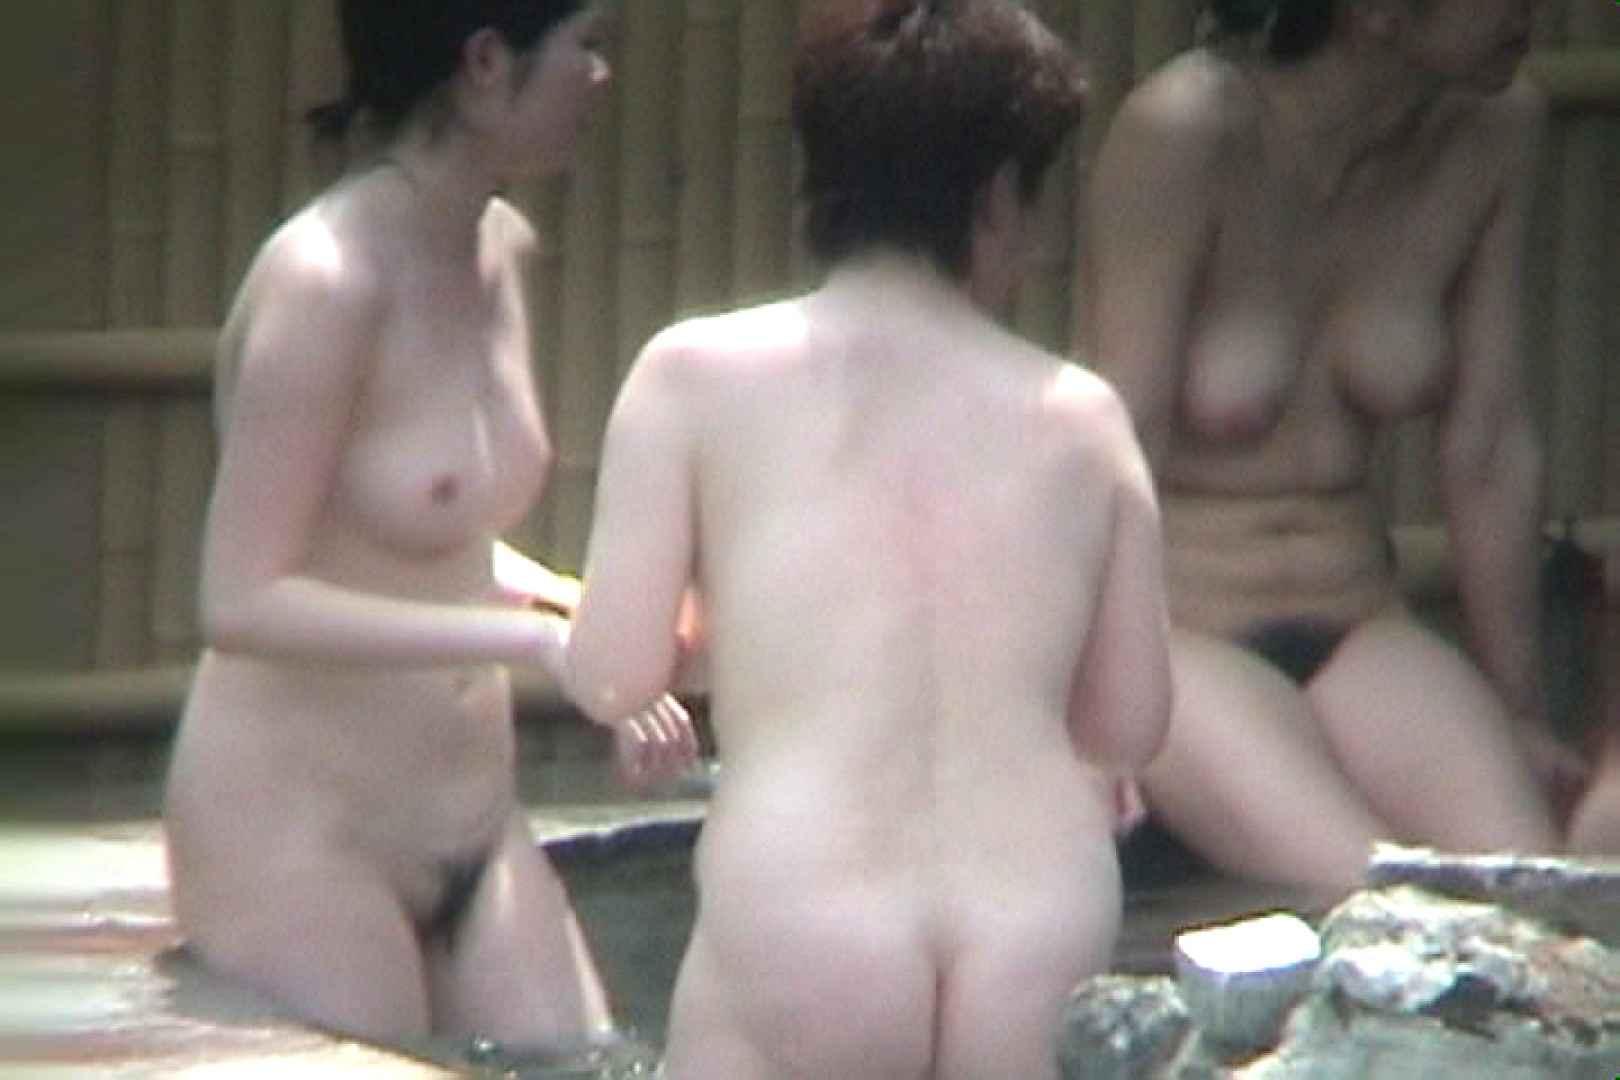 Aquaな露天風呂Vol.54【VIP限定】 露天風呂突入 | 美しいOLの裸体  88pic 76